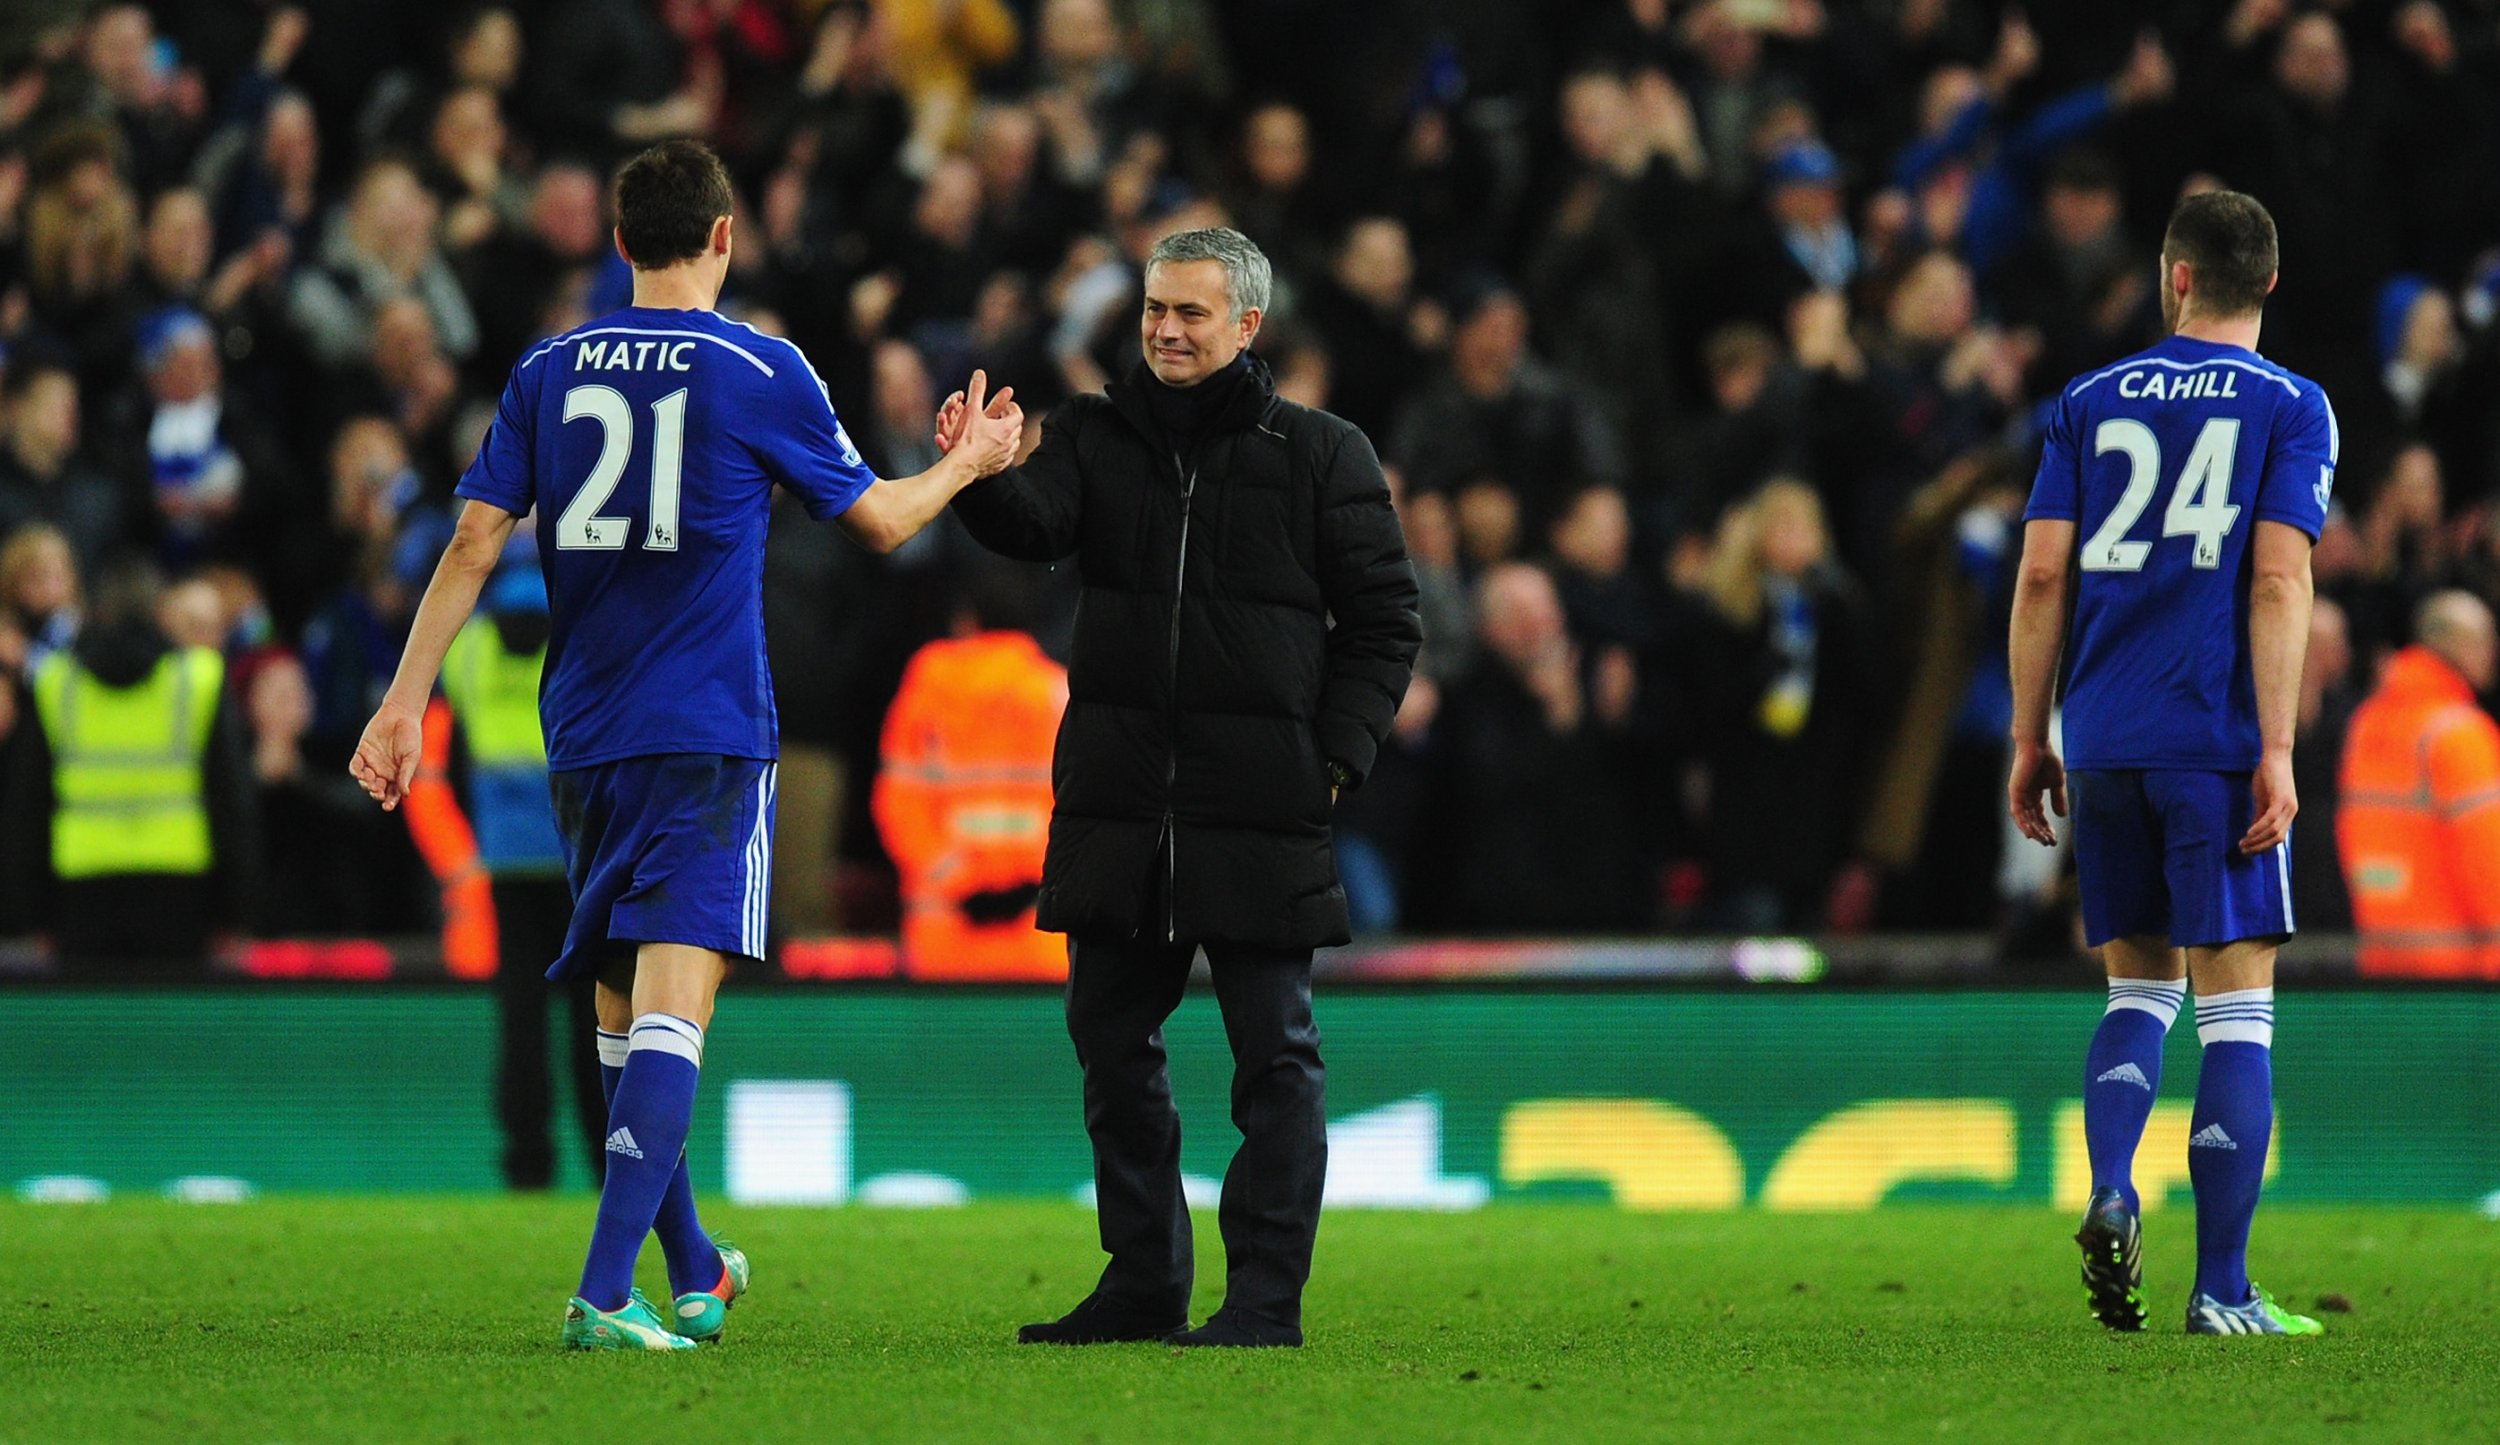 Former Chelsea manager Jose Mourinho, center, with Nemanja Matic, left.